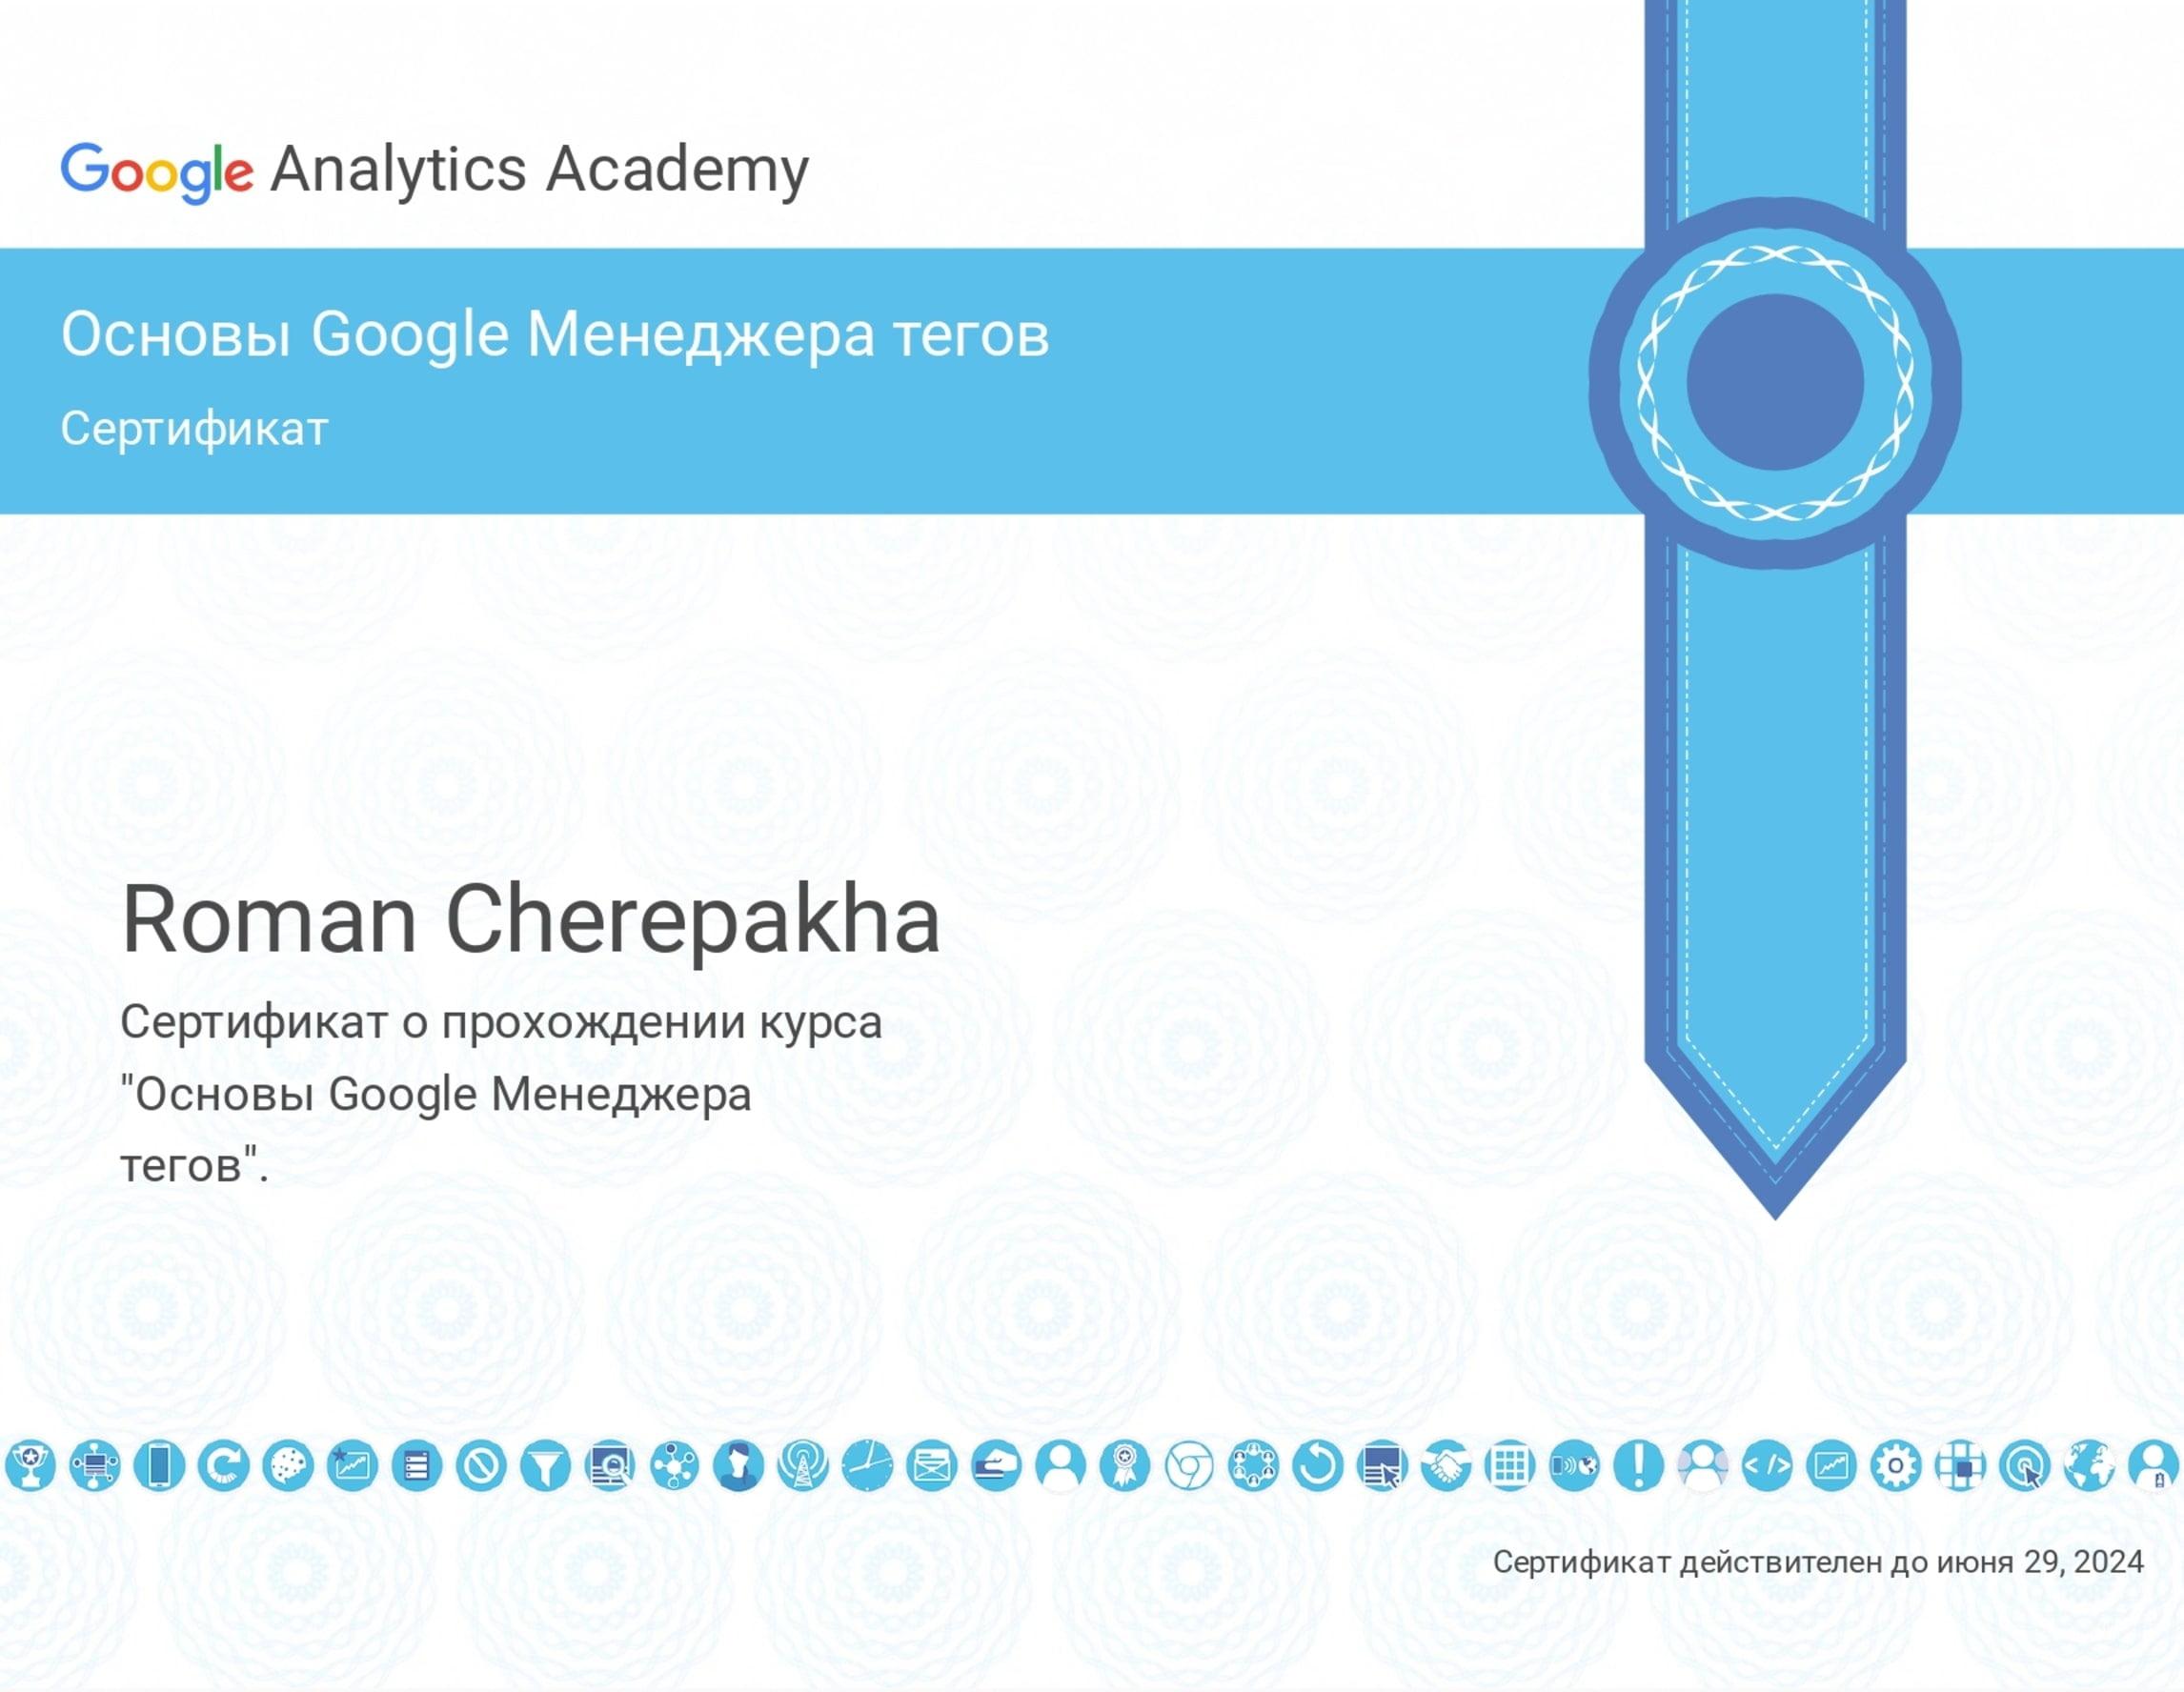 Сертификат Google Analytics Роман Черепаха